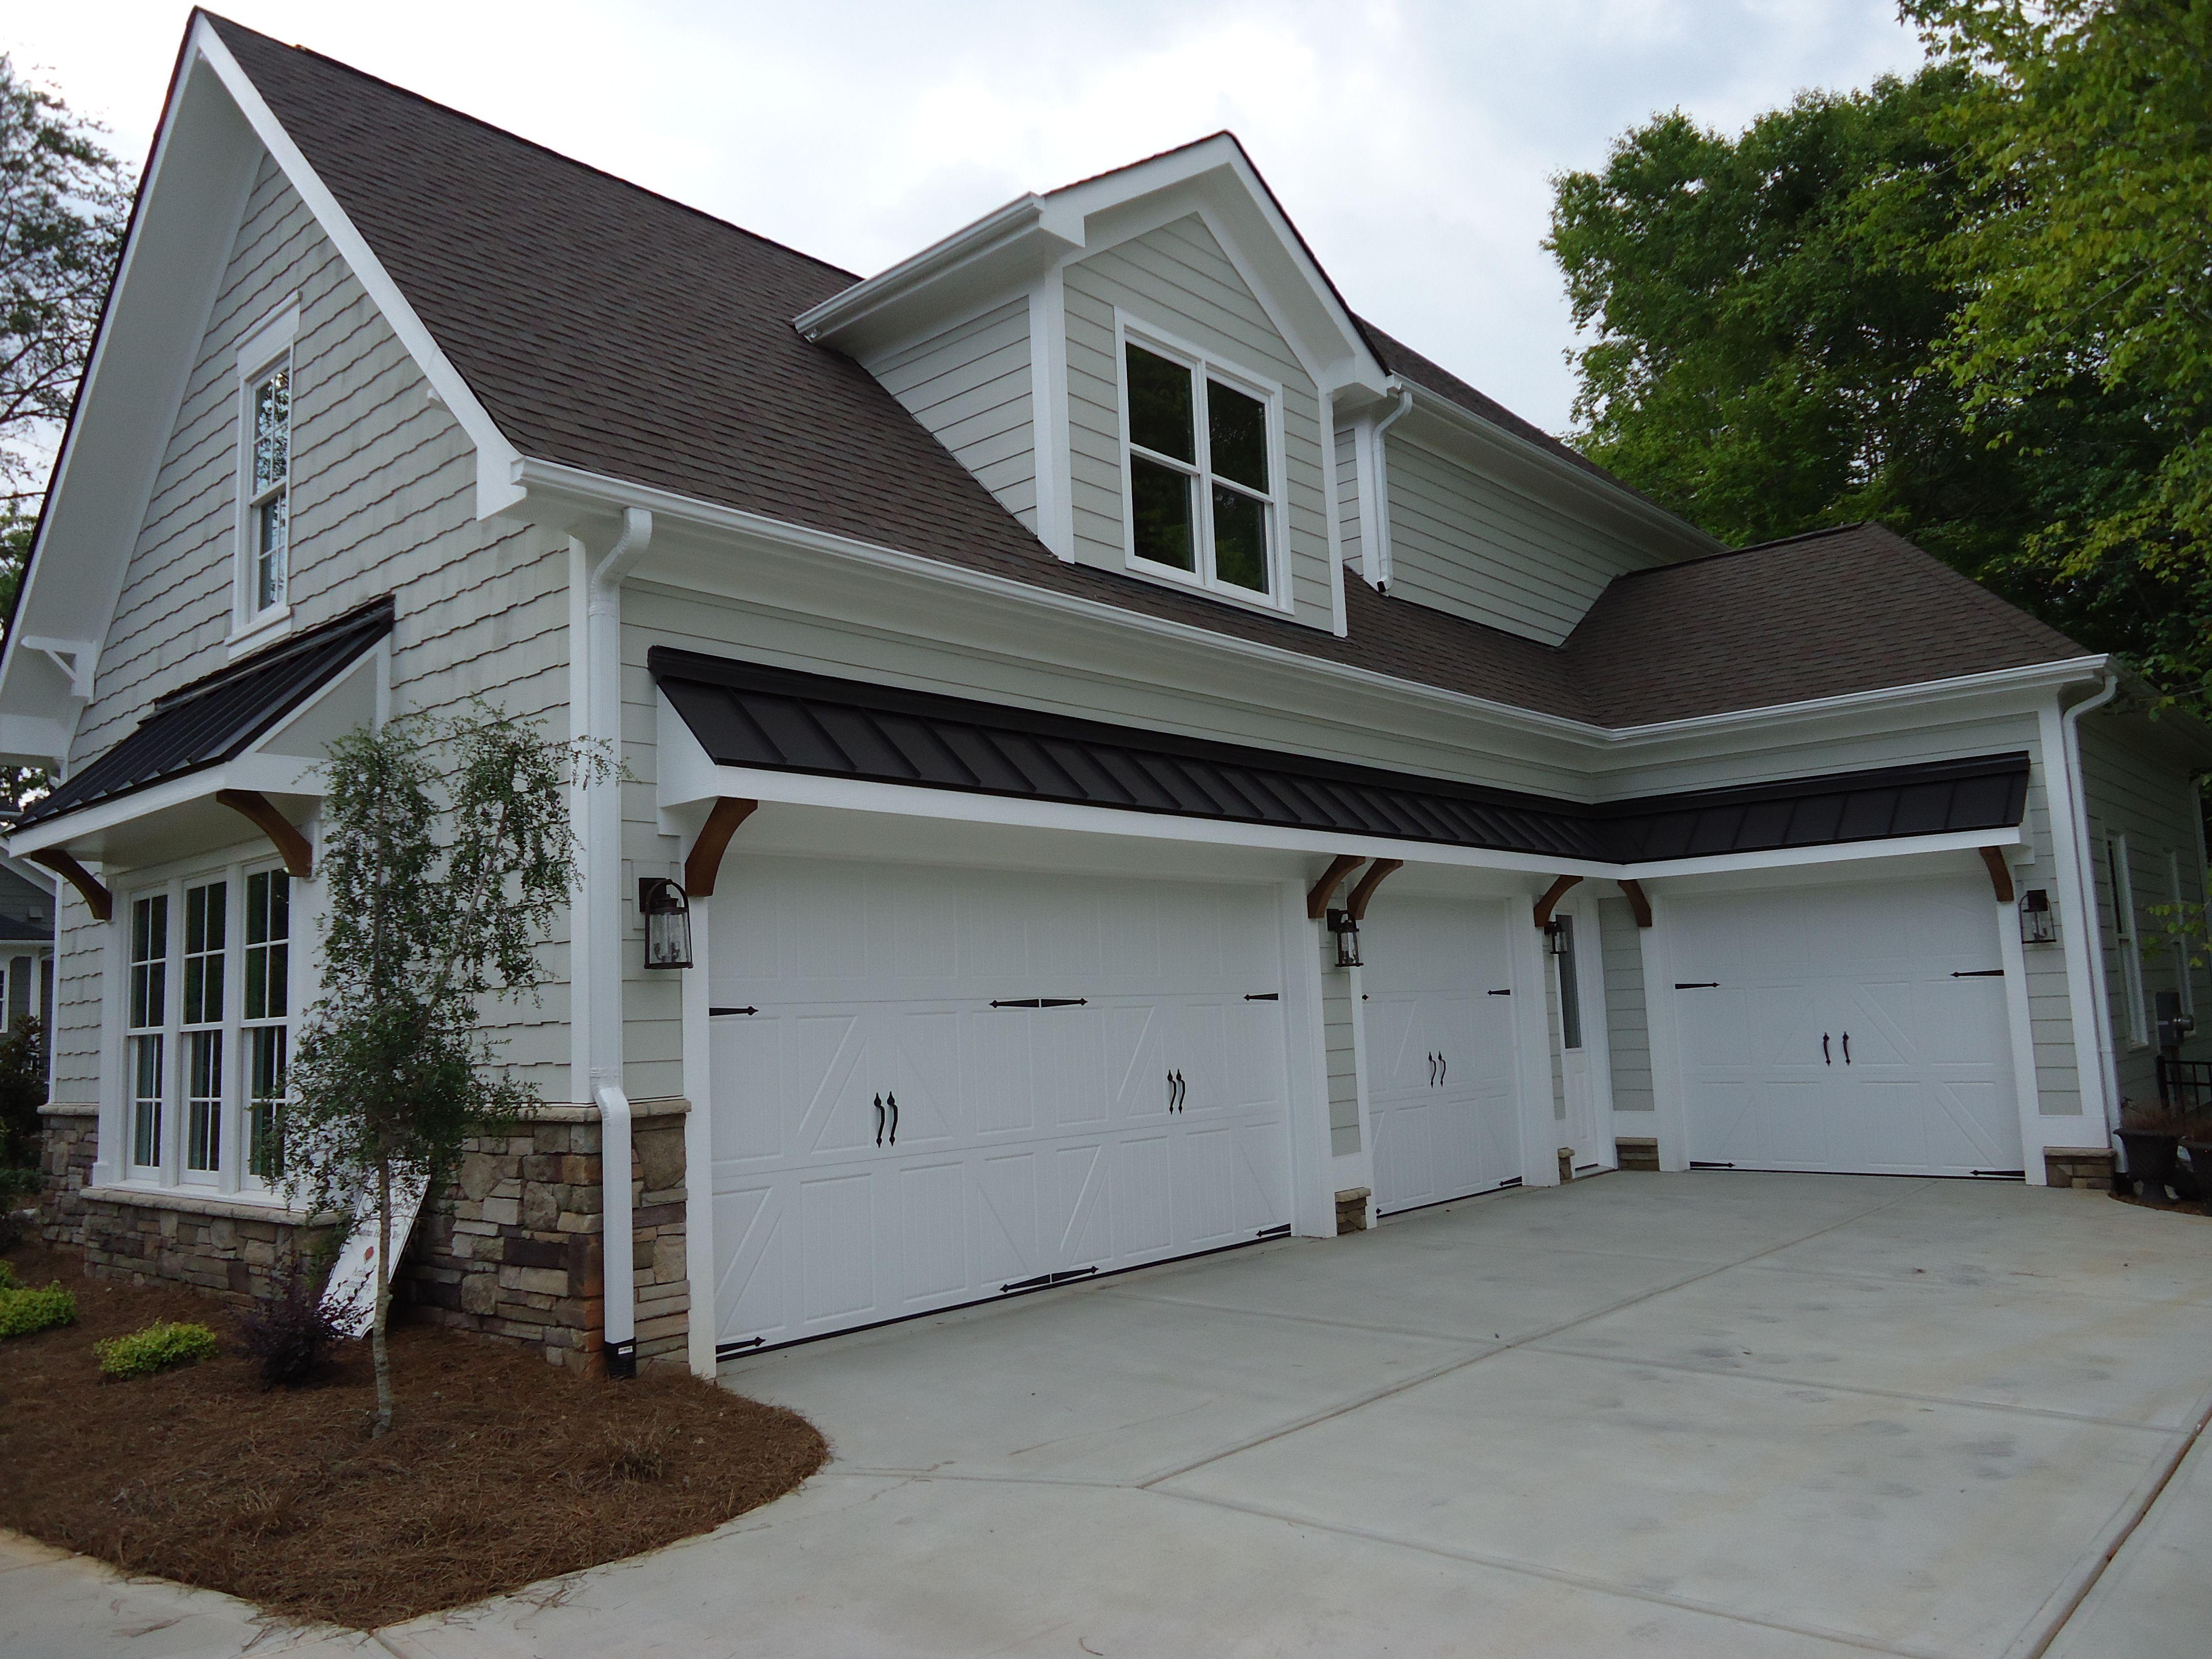 Arh Plan Asheville 1131f Exterior 10 Owens Corning Teak Metal Roof Sentriclad Dark Bronze Soffits Fasc House Exterior White Brick Houses Grey Exterior